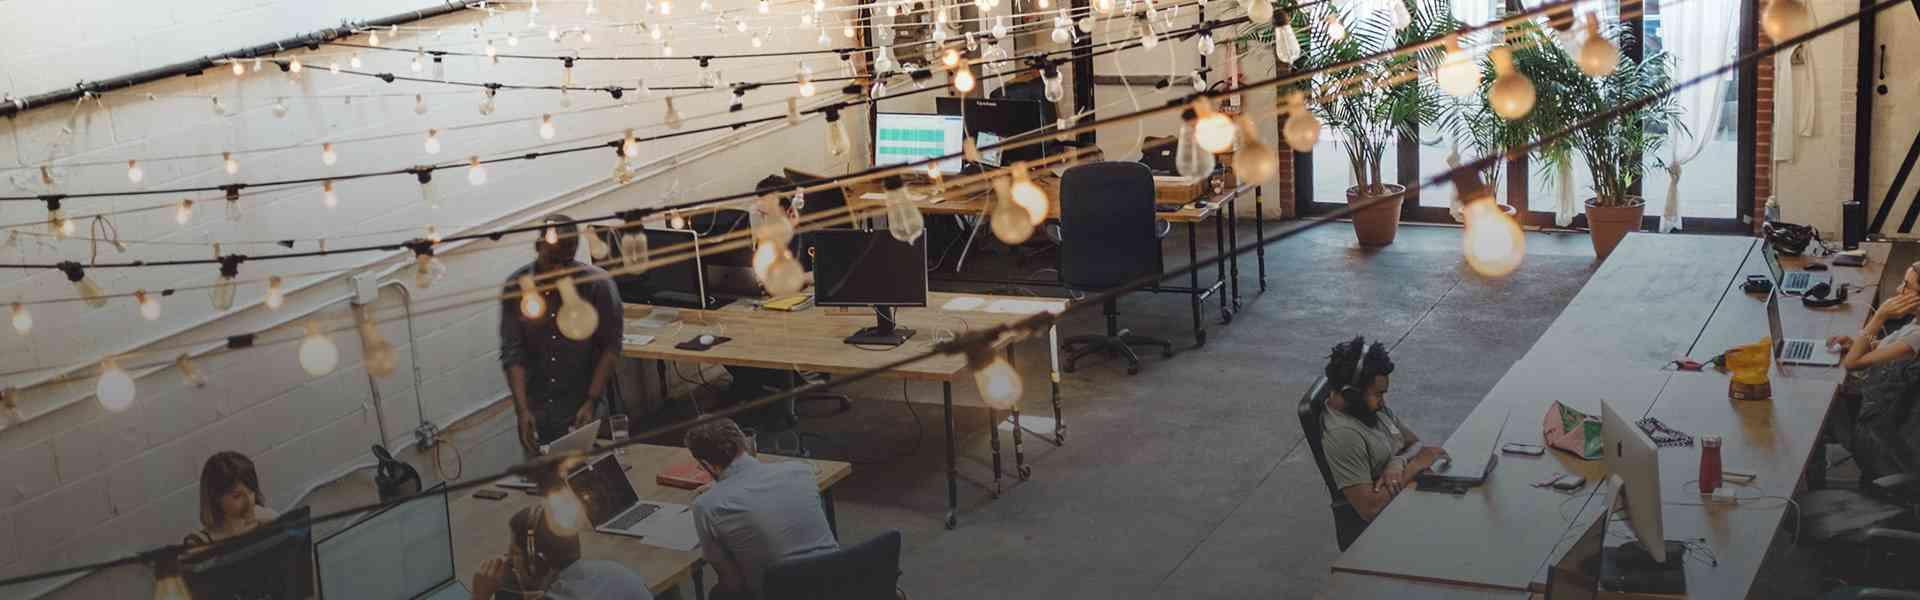 Louer un bureau en coworking